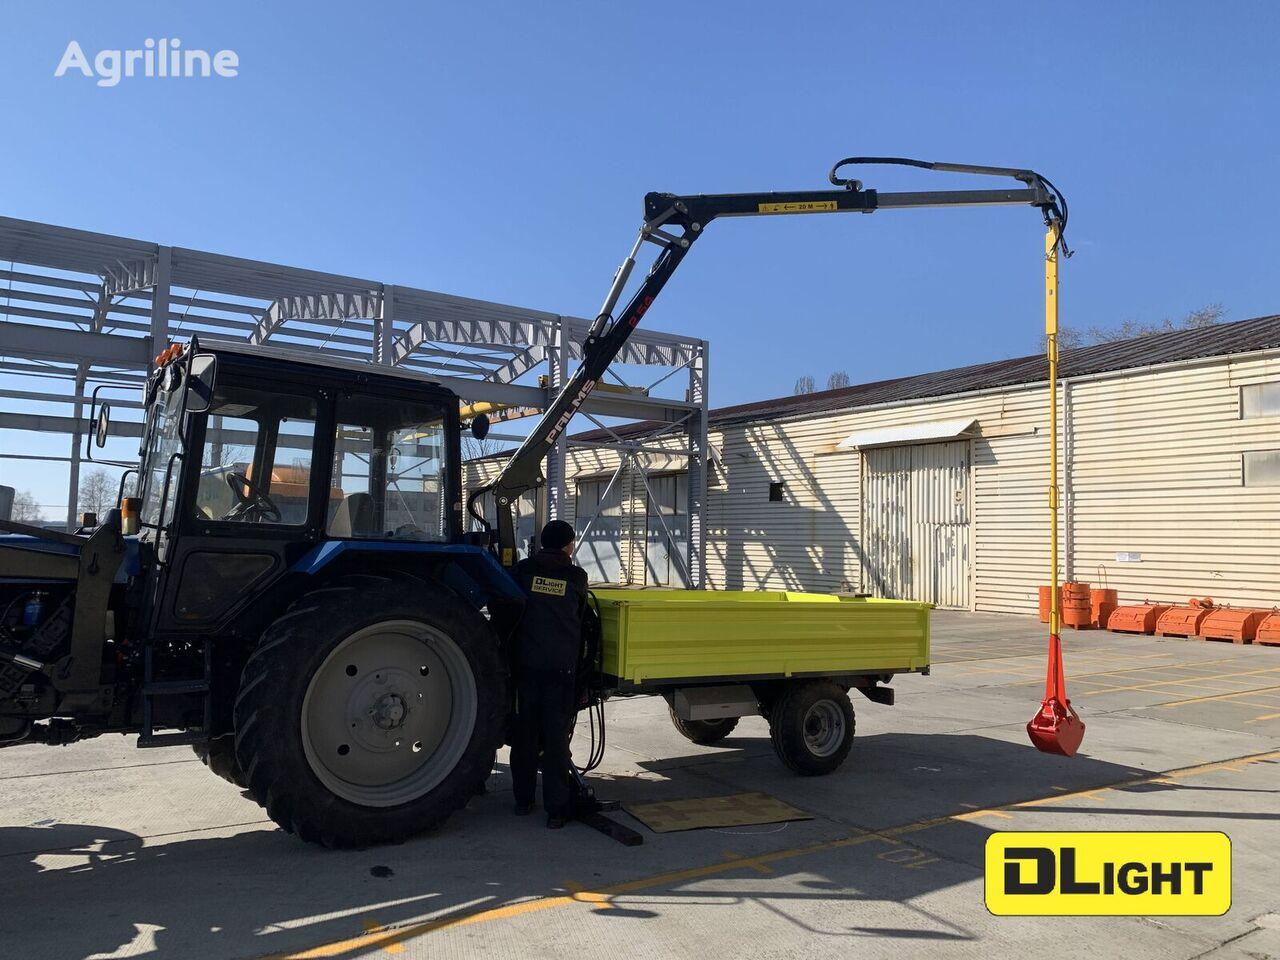 DLight DL CityMaster remolque agrícola nuevo